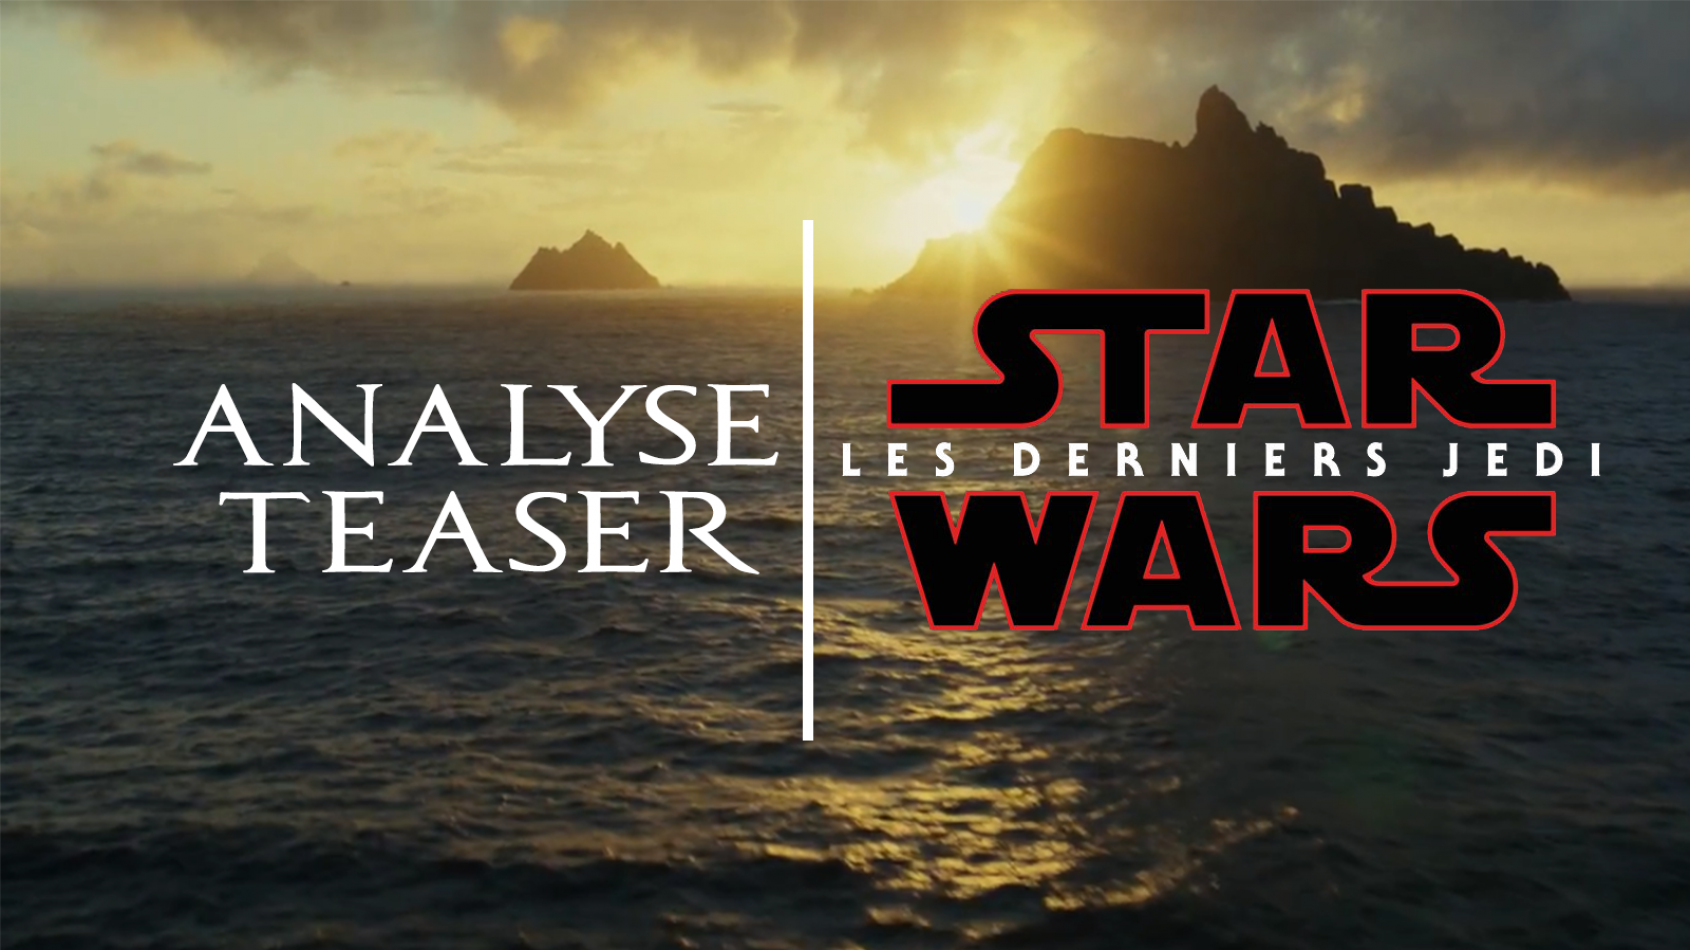 Analyse du teaser de Star Wars Episode VIII : Les Derniers Jedi !